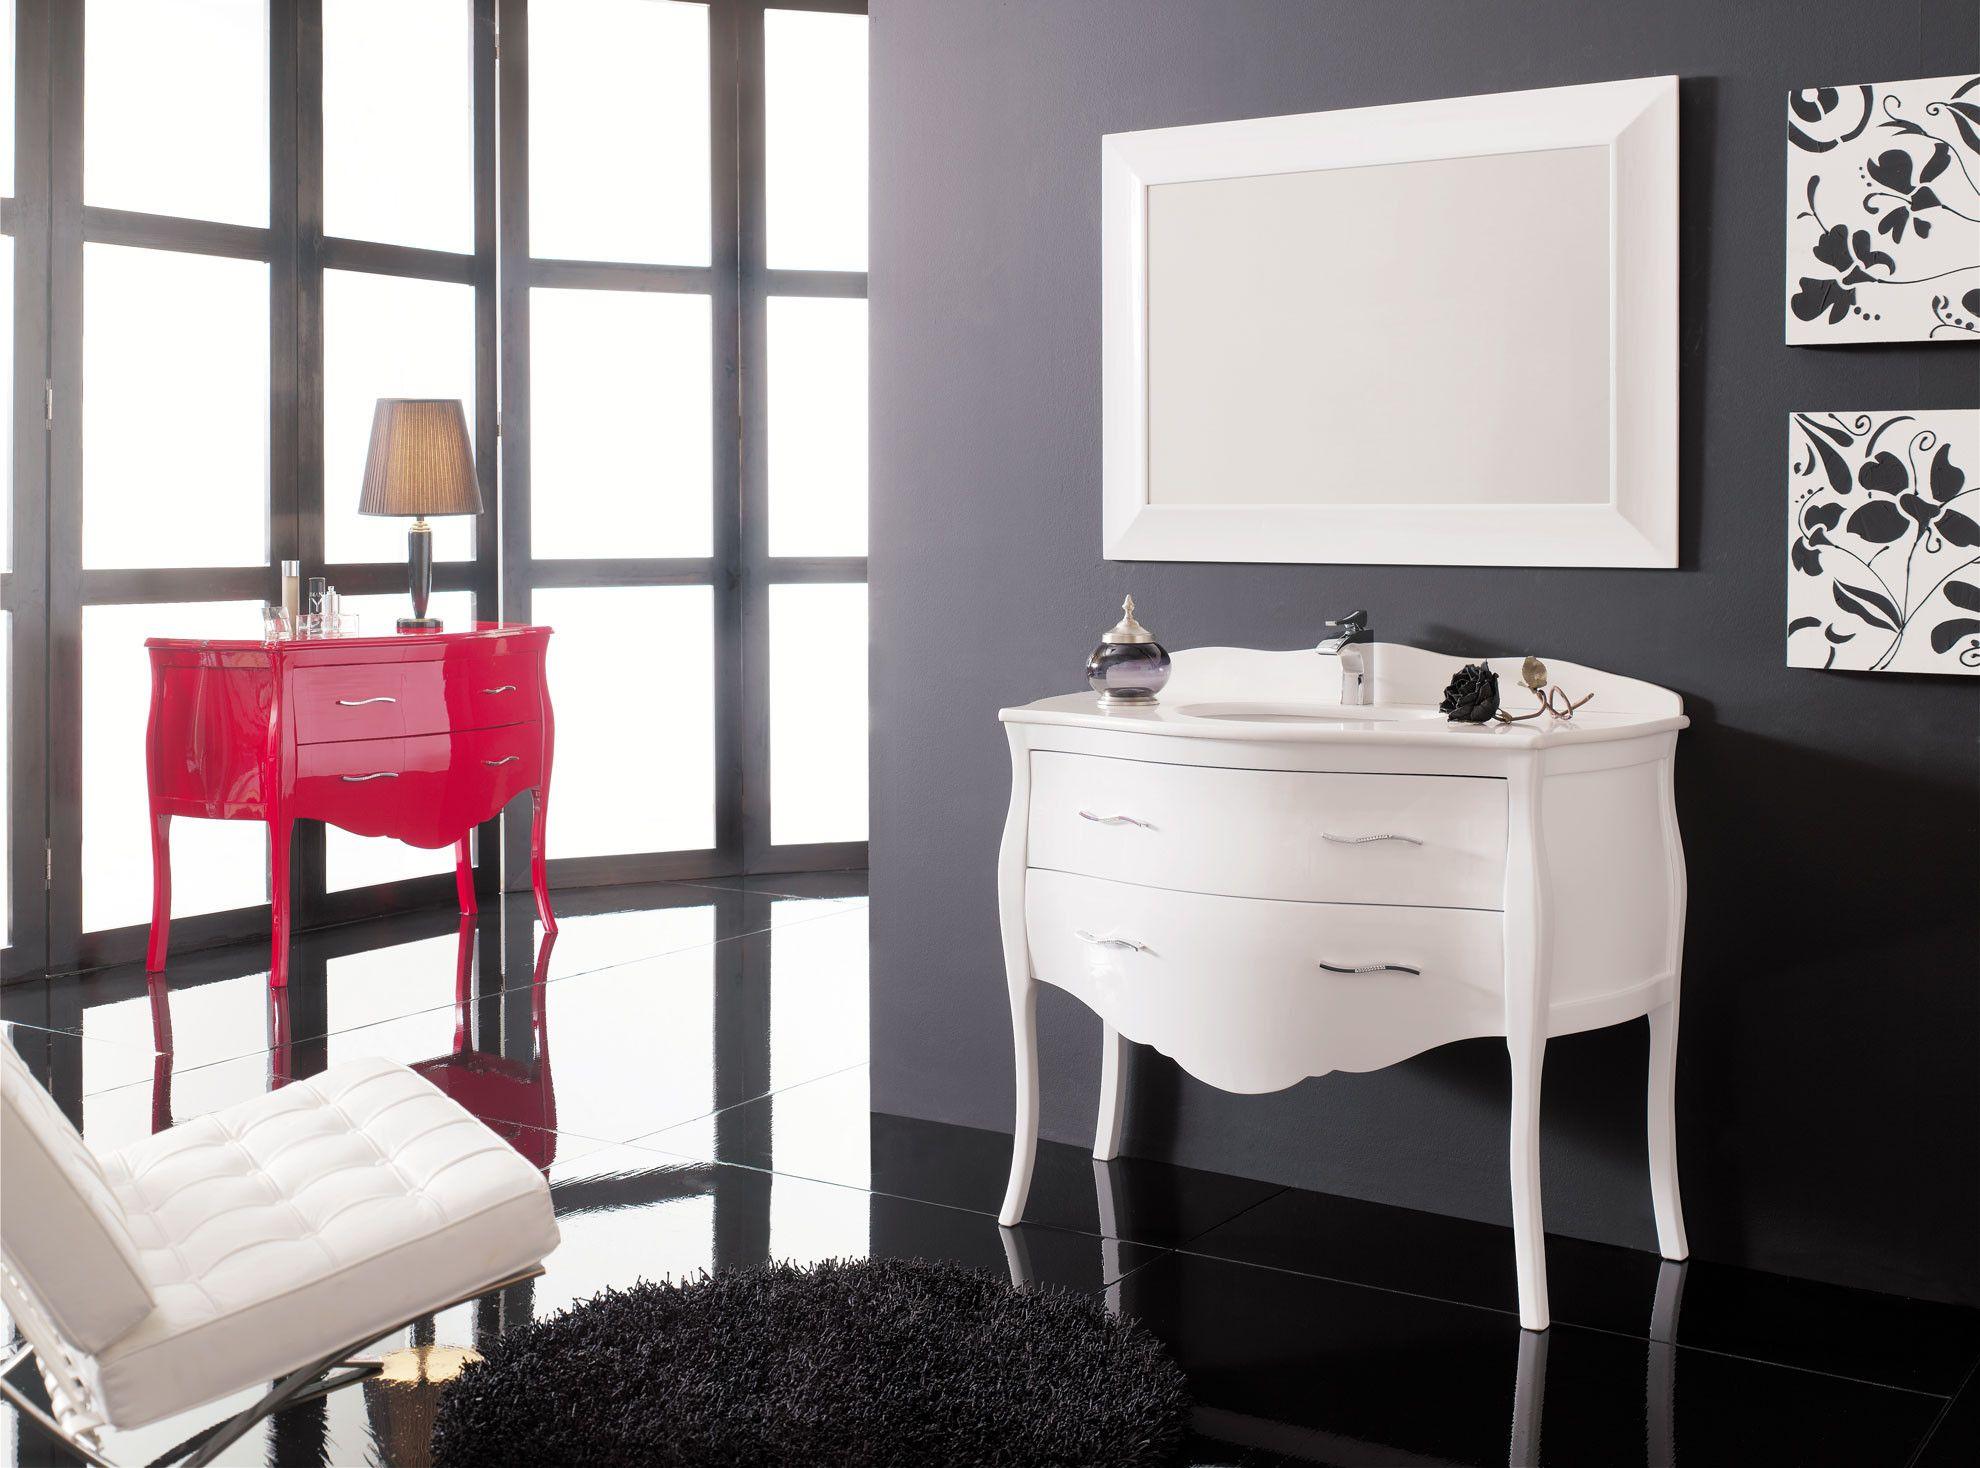 Mueble de baño Luis XV blanco brillo 90 cm. | Salle de bain | Pinterest